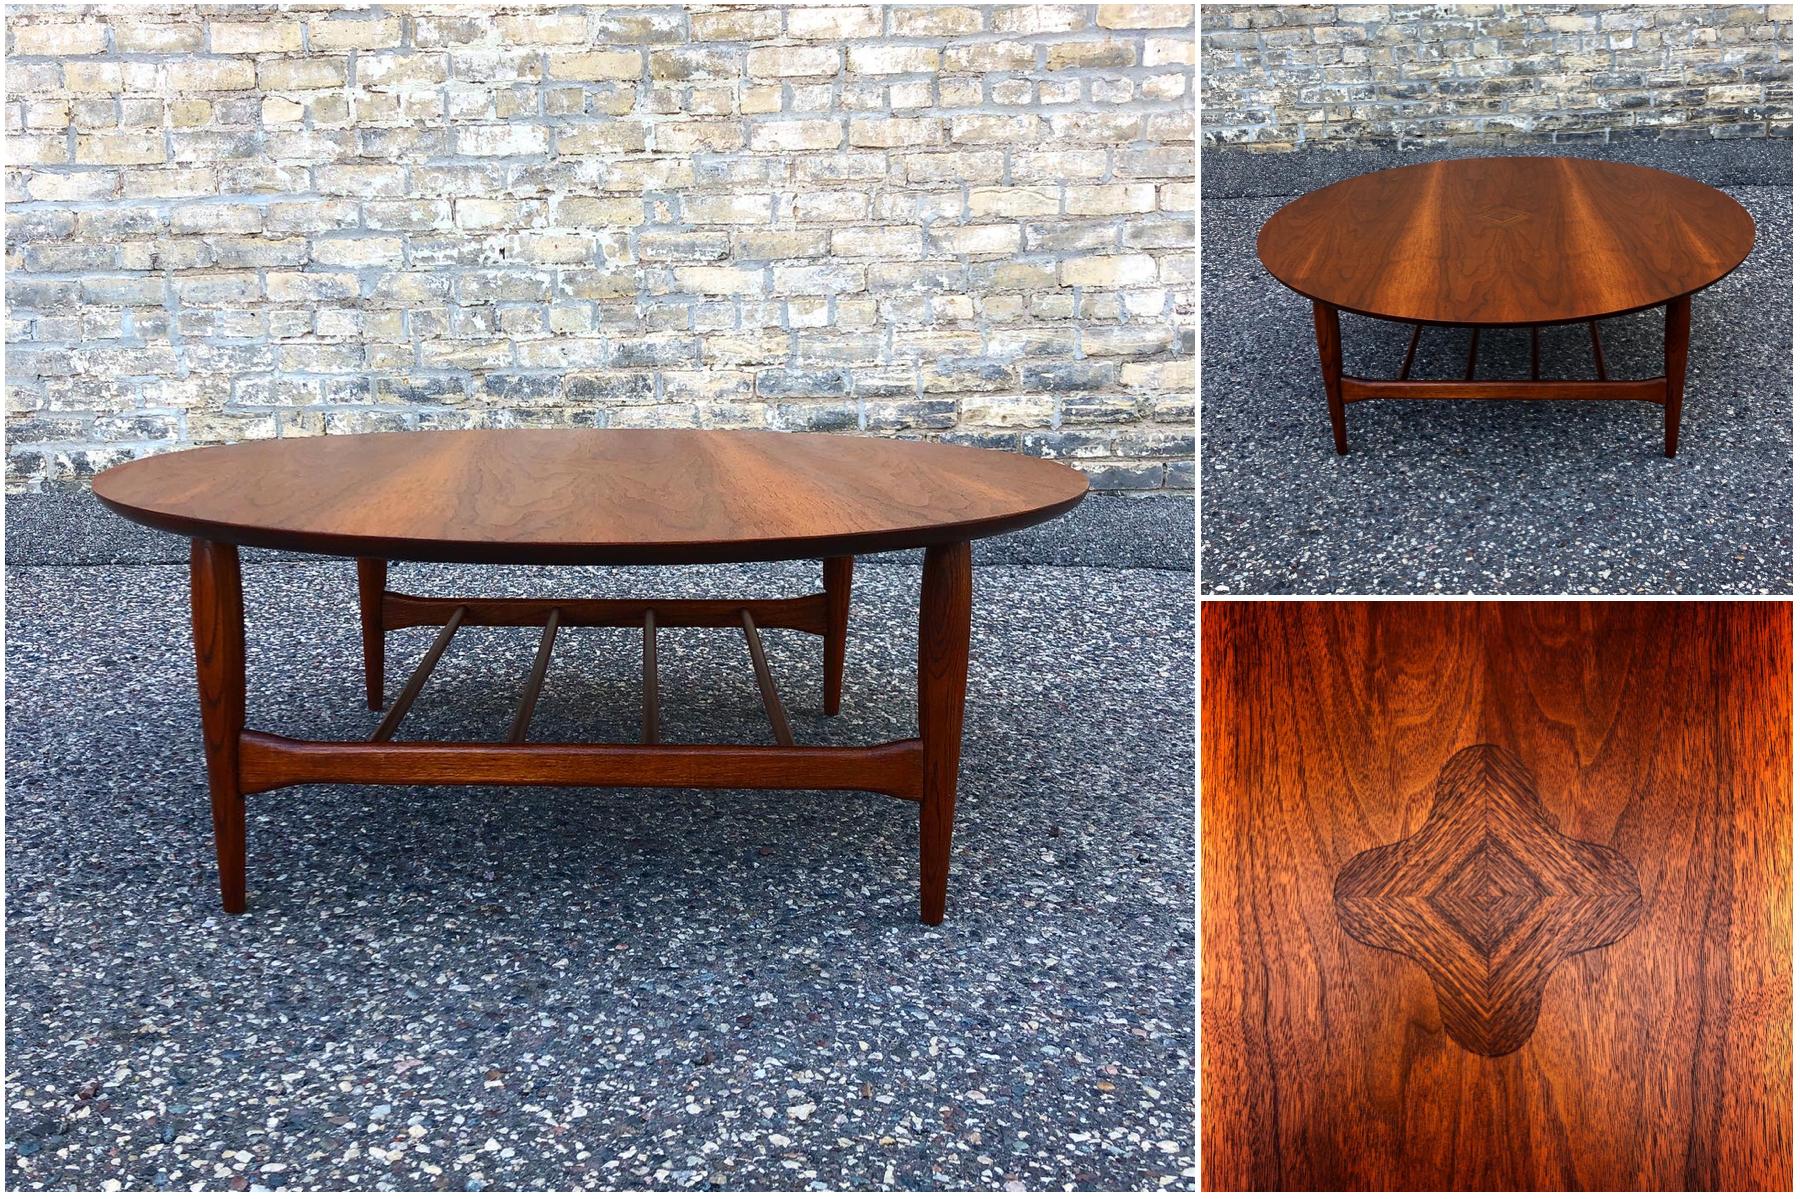 Bassett walnut round coffee table - mid-century modern